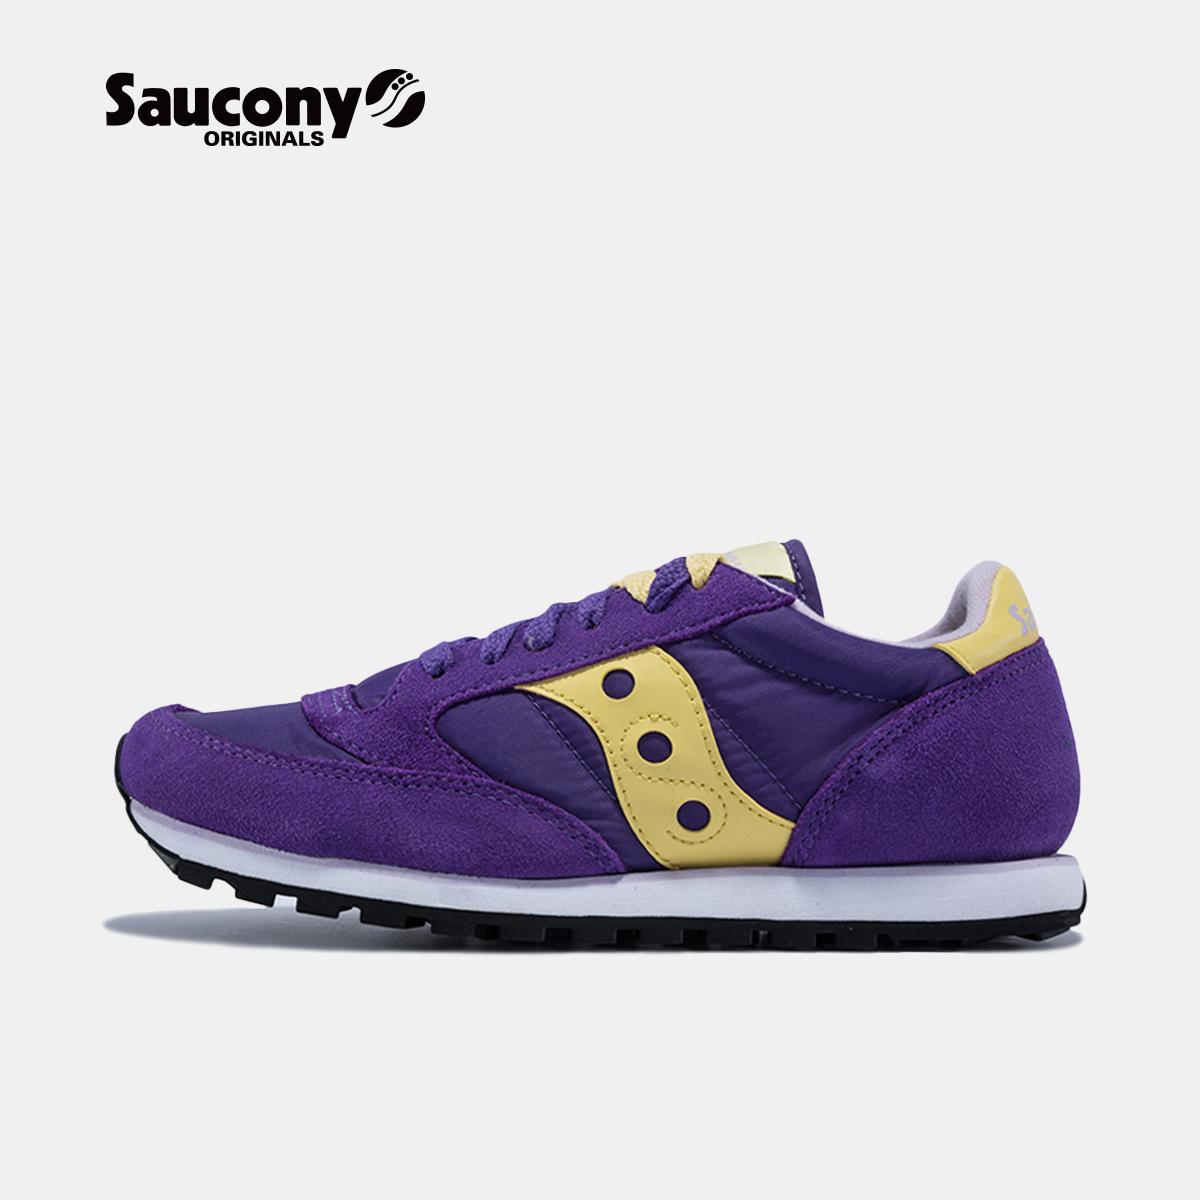 Saucony圣康尼 JAZZ LOWPRO 复古跑鞋运动鞋女鞋跑步鞋S1866-C